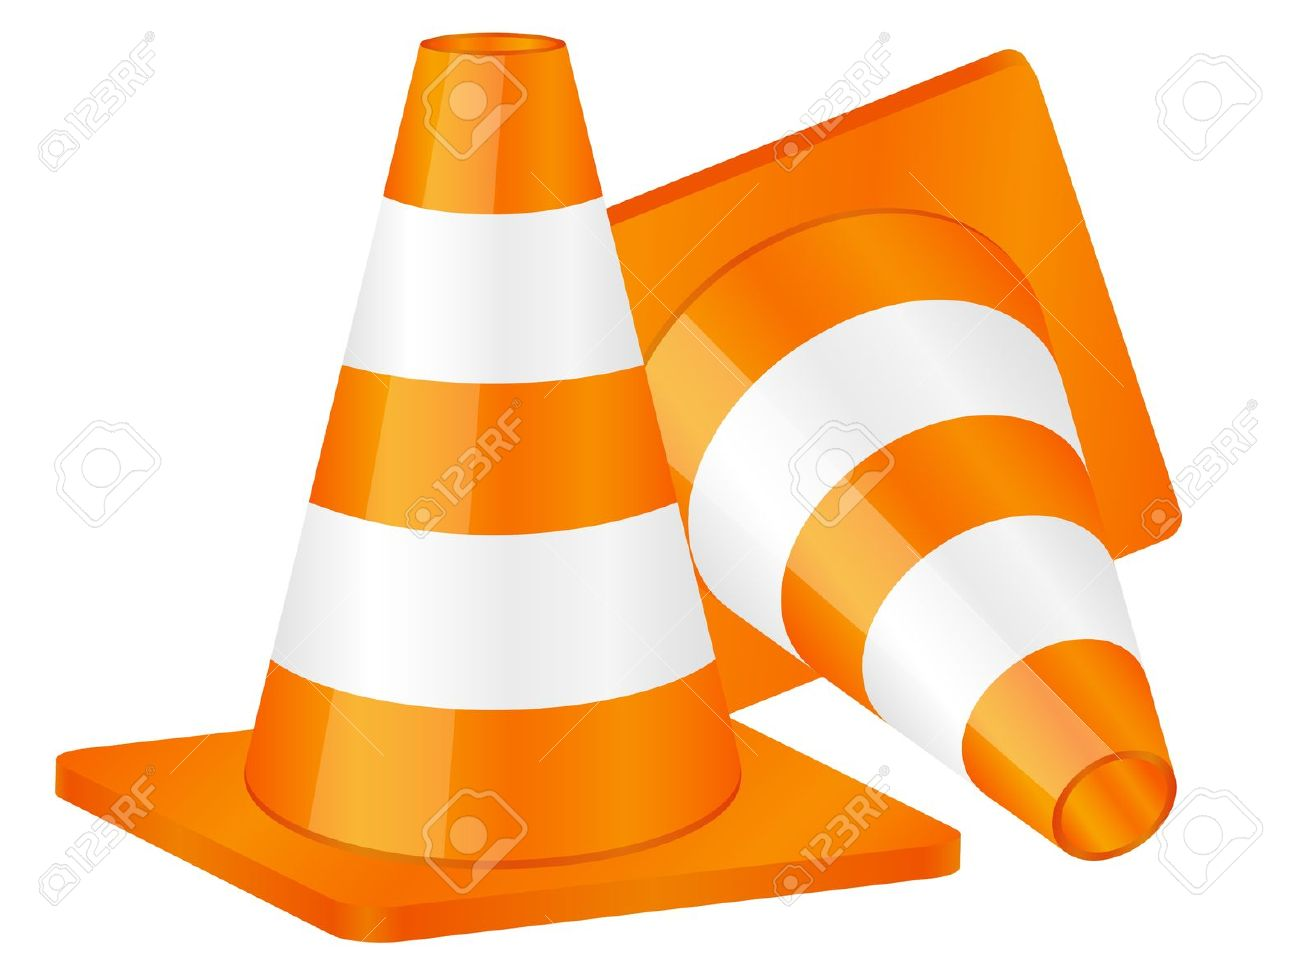 Construction cone clip art.